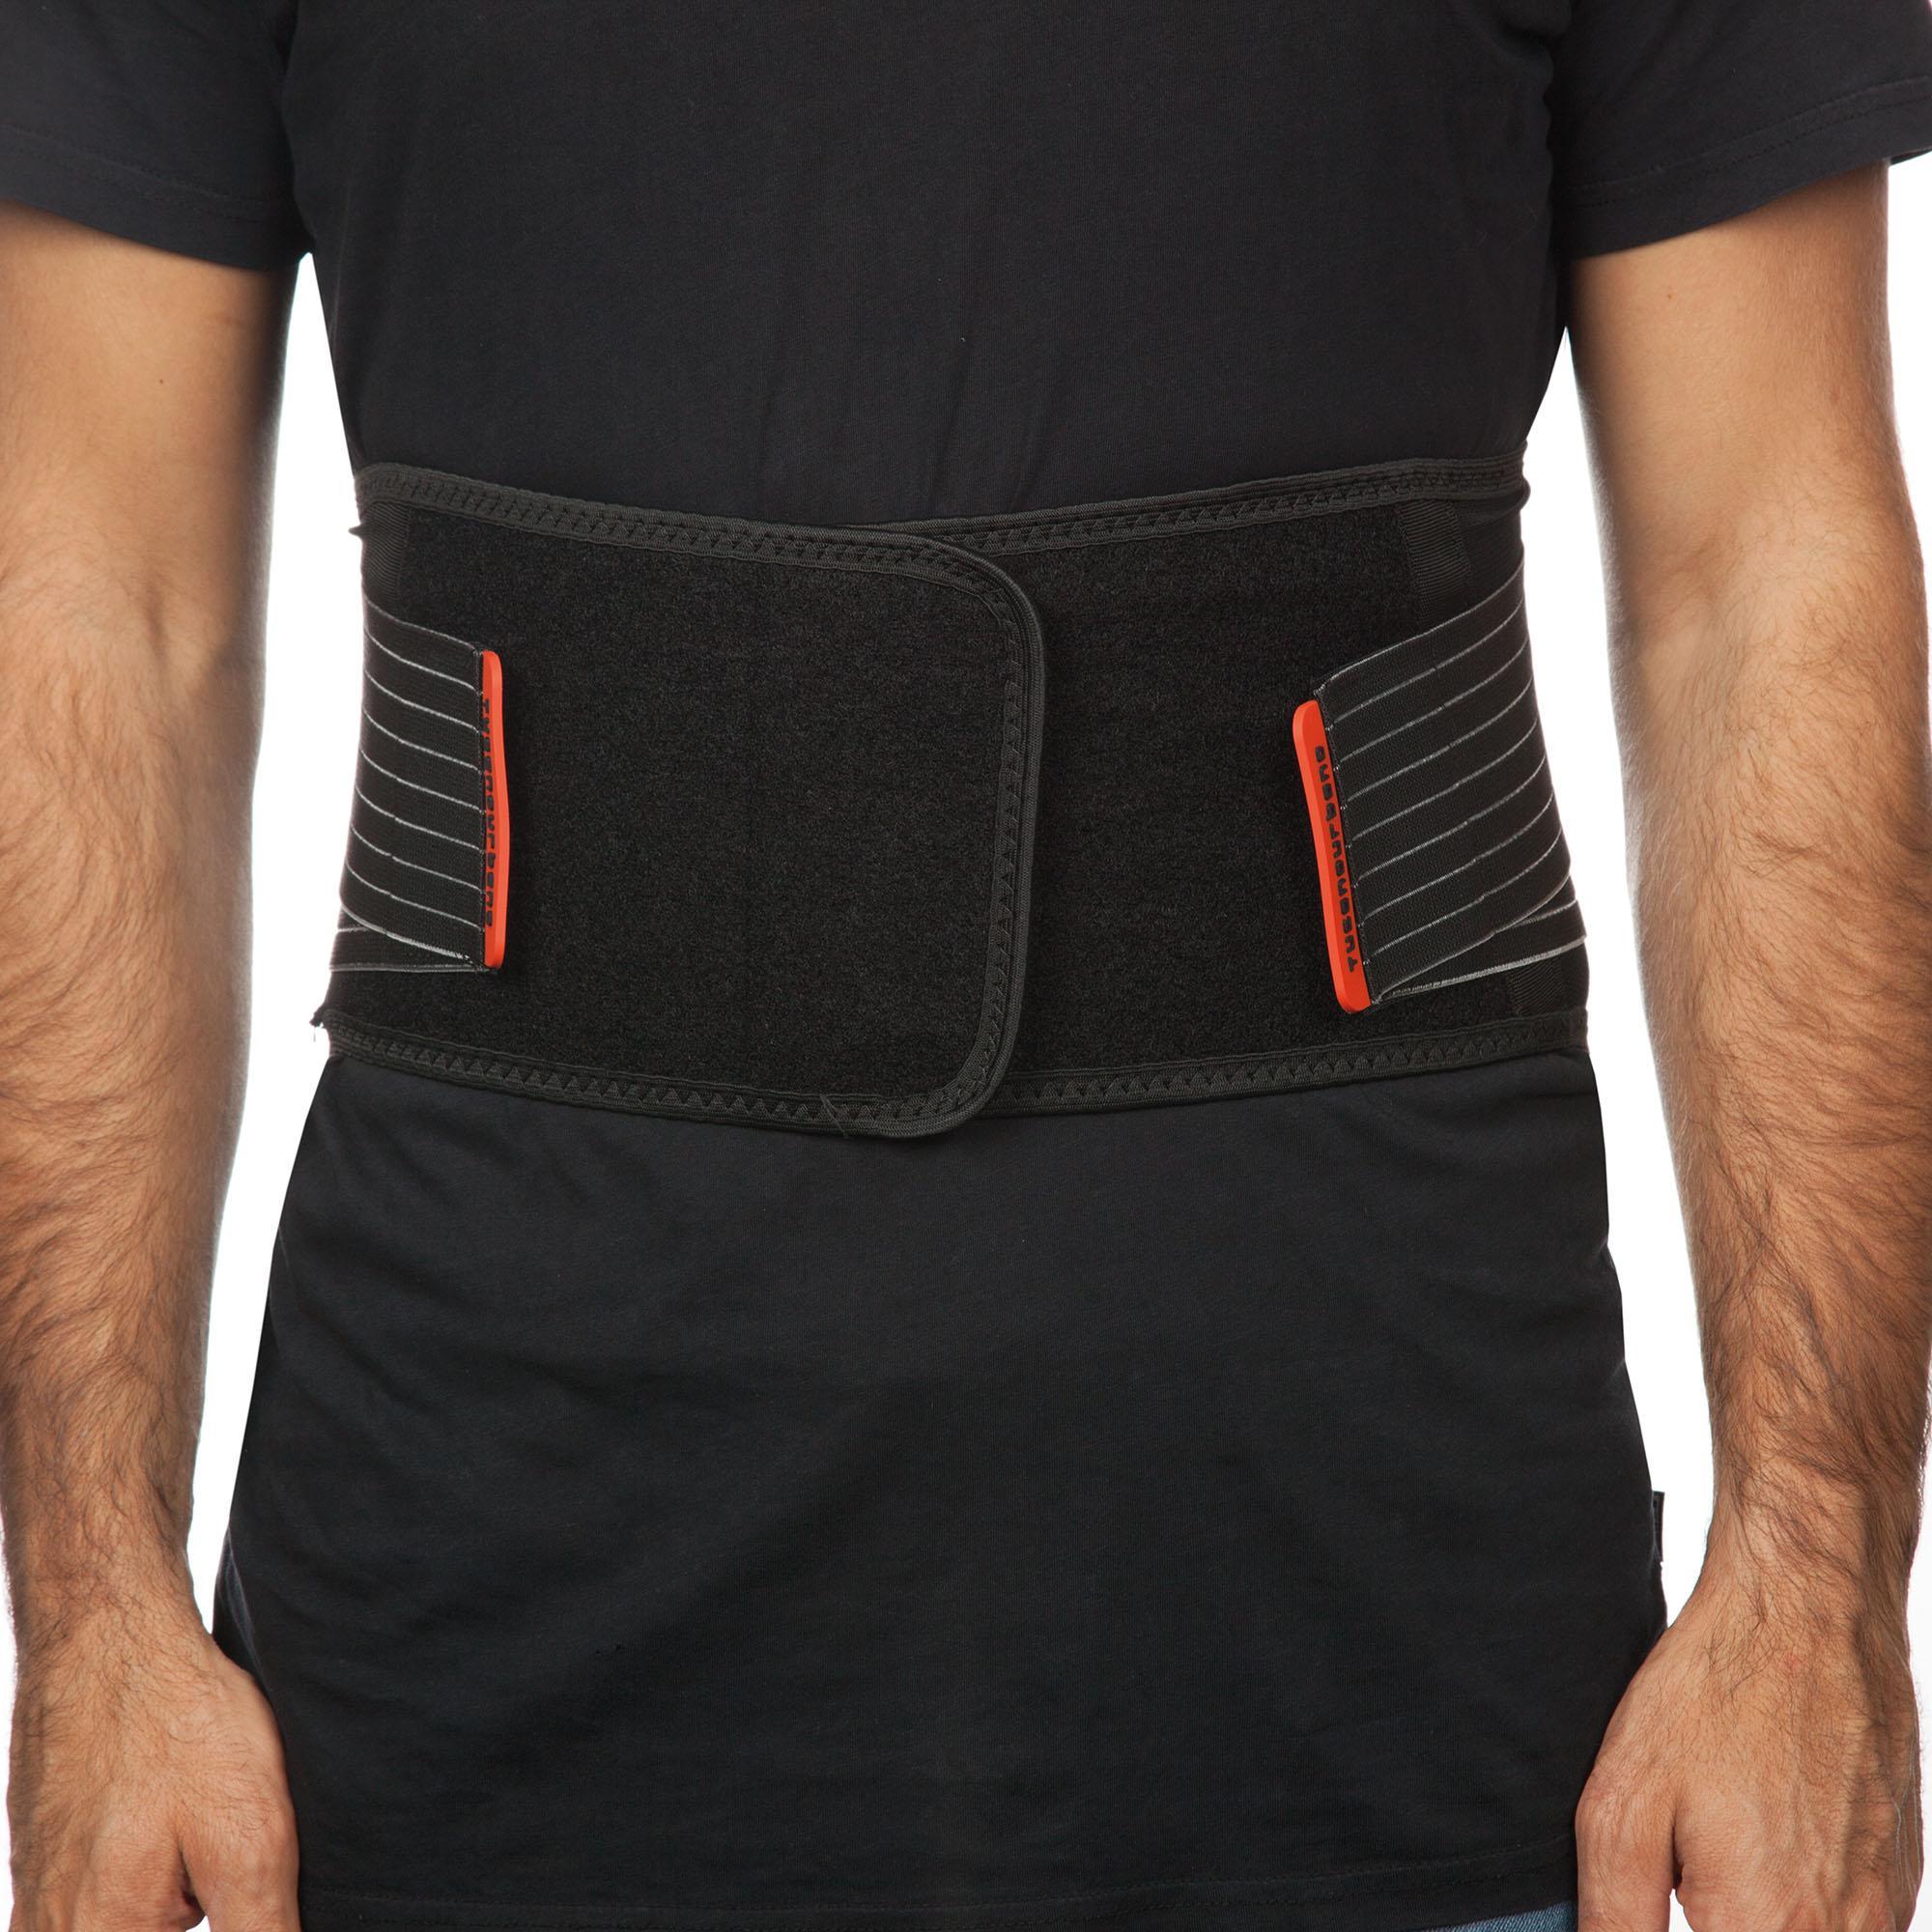 Kidney Belt Cintuka 2g Black